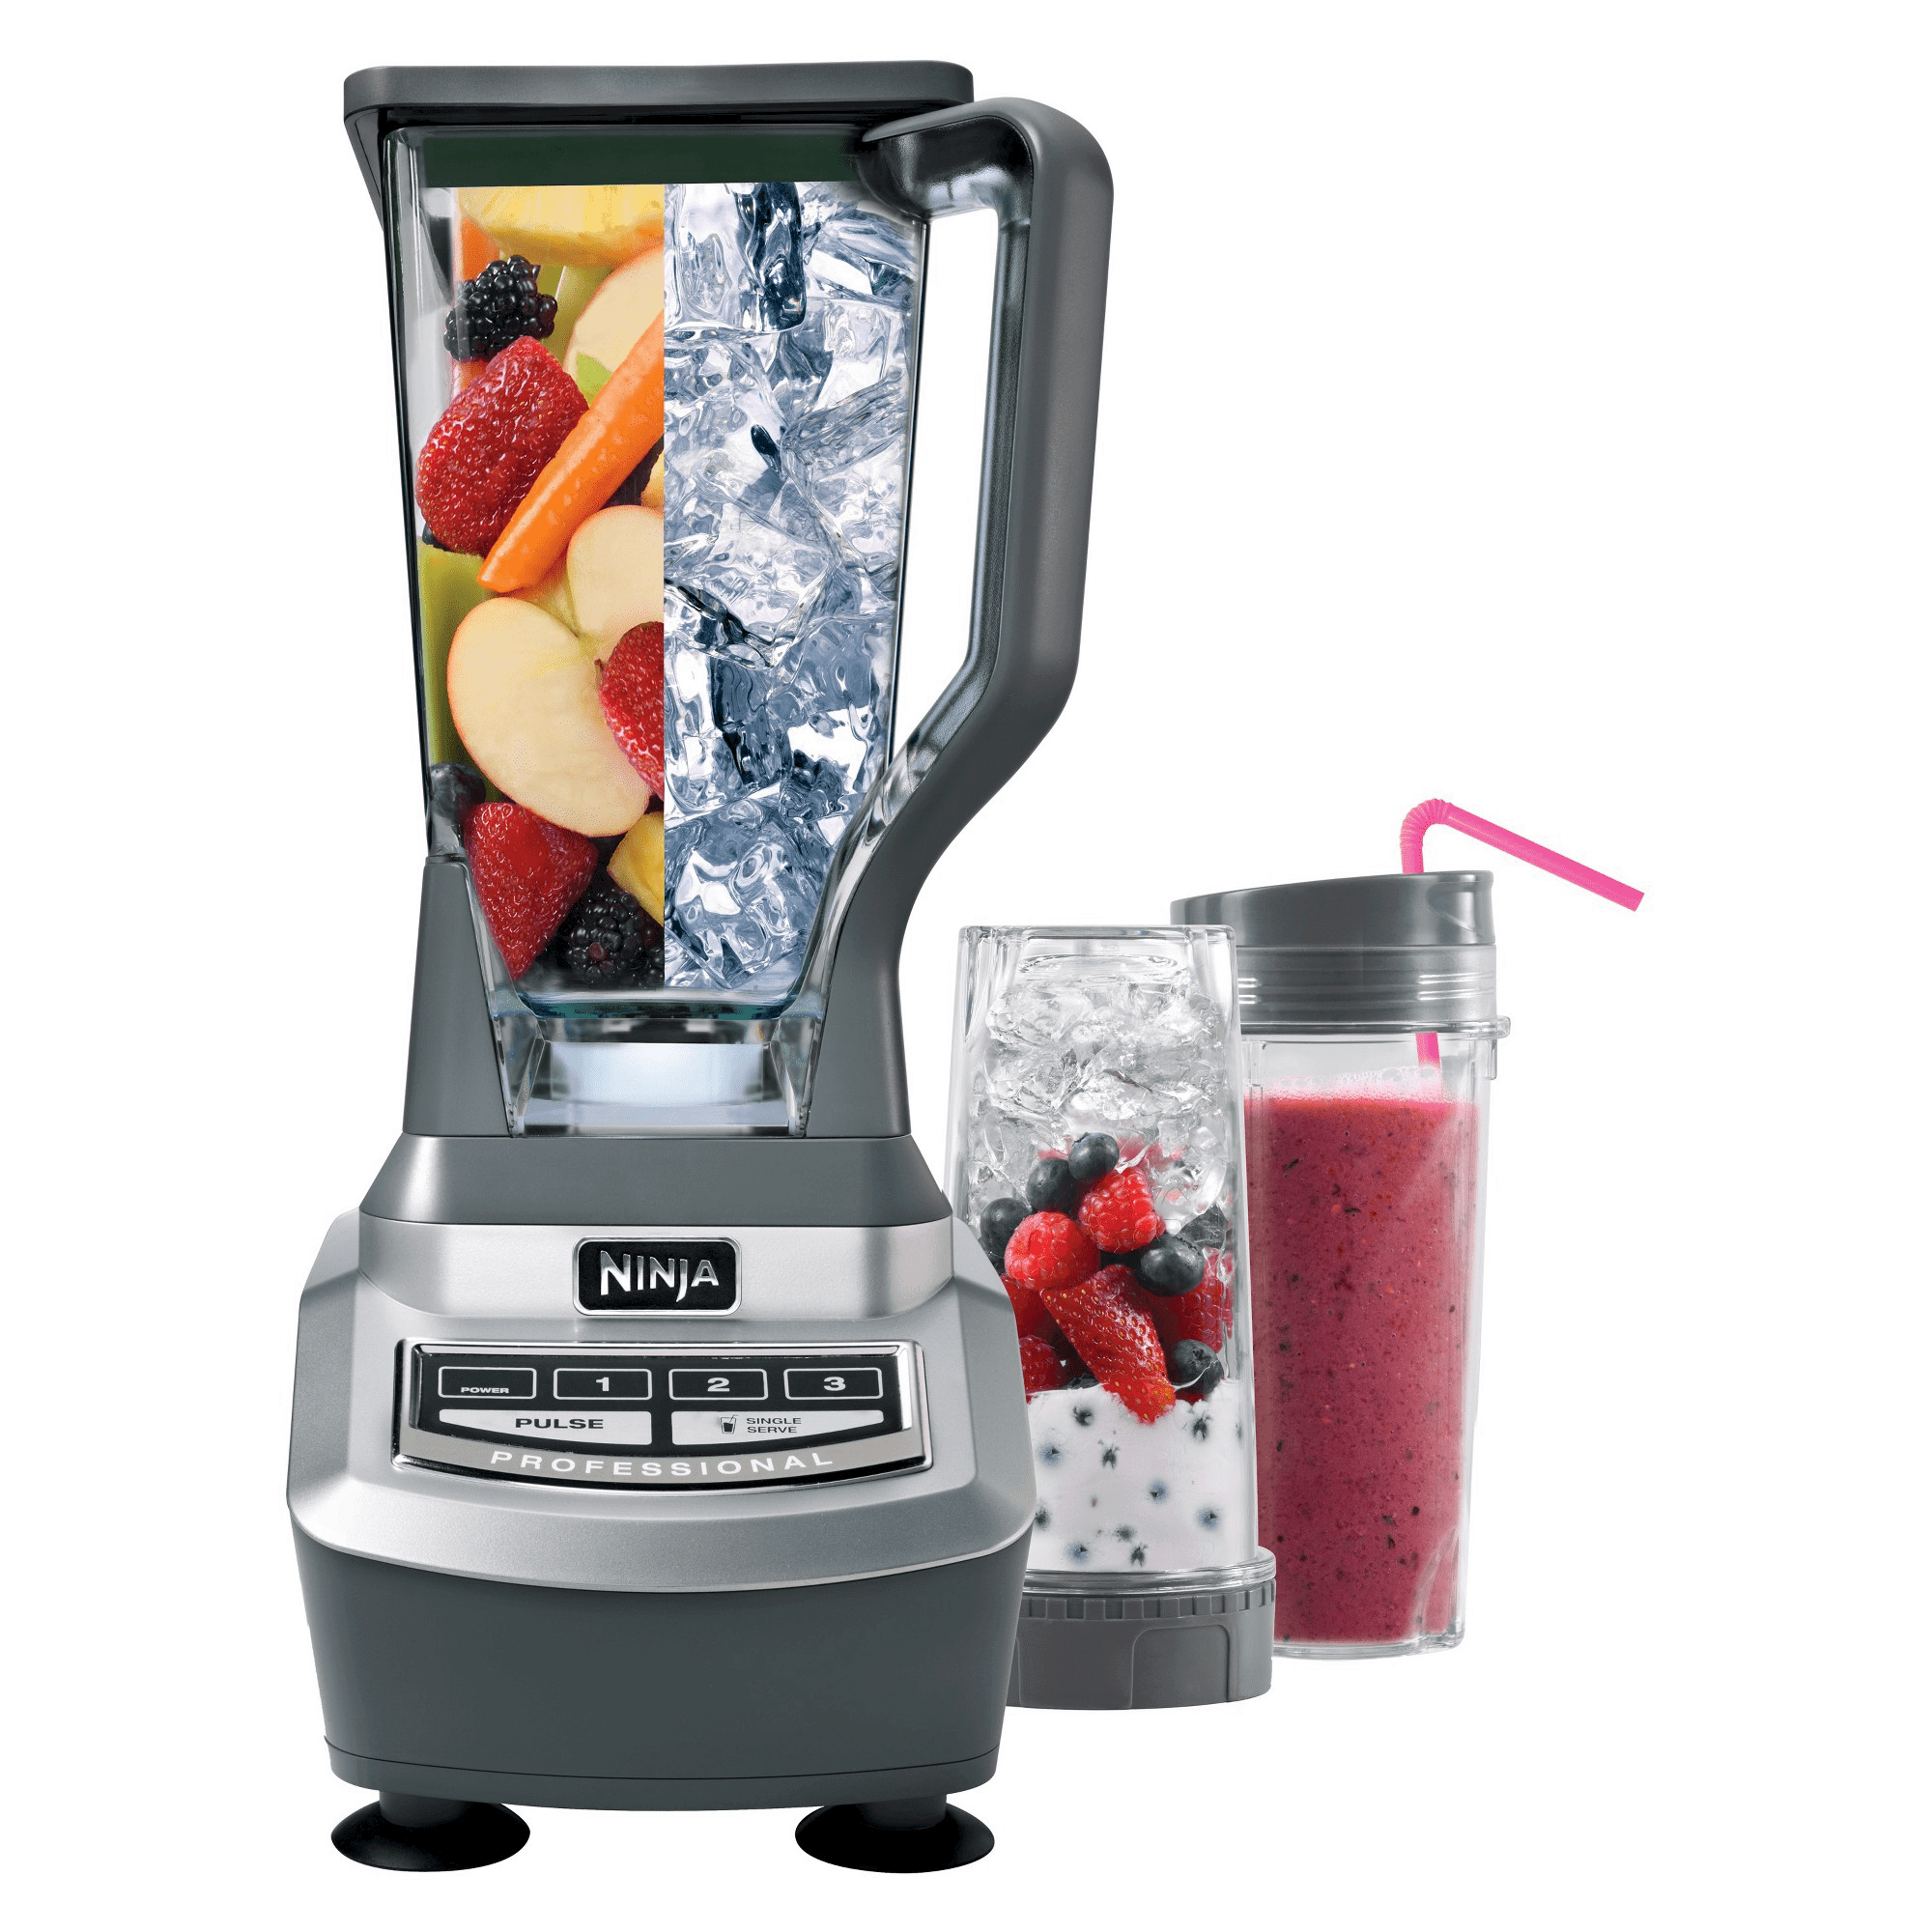 Ninja Pro Blender with Personal Jar (BL740) for $48 + FS